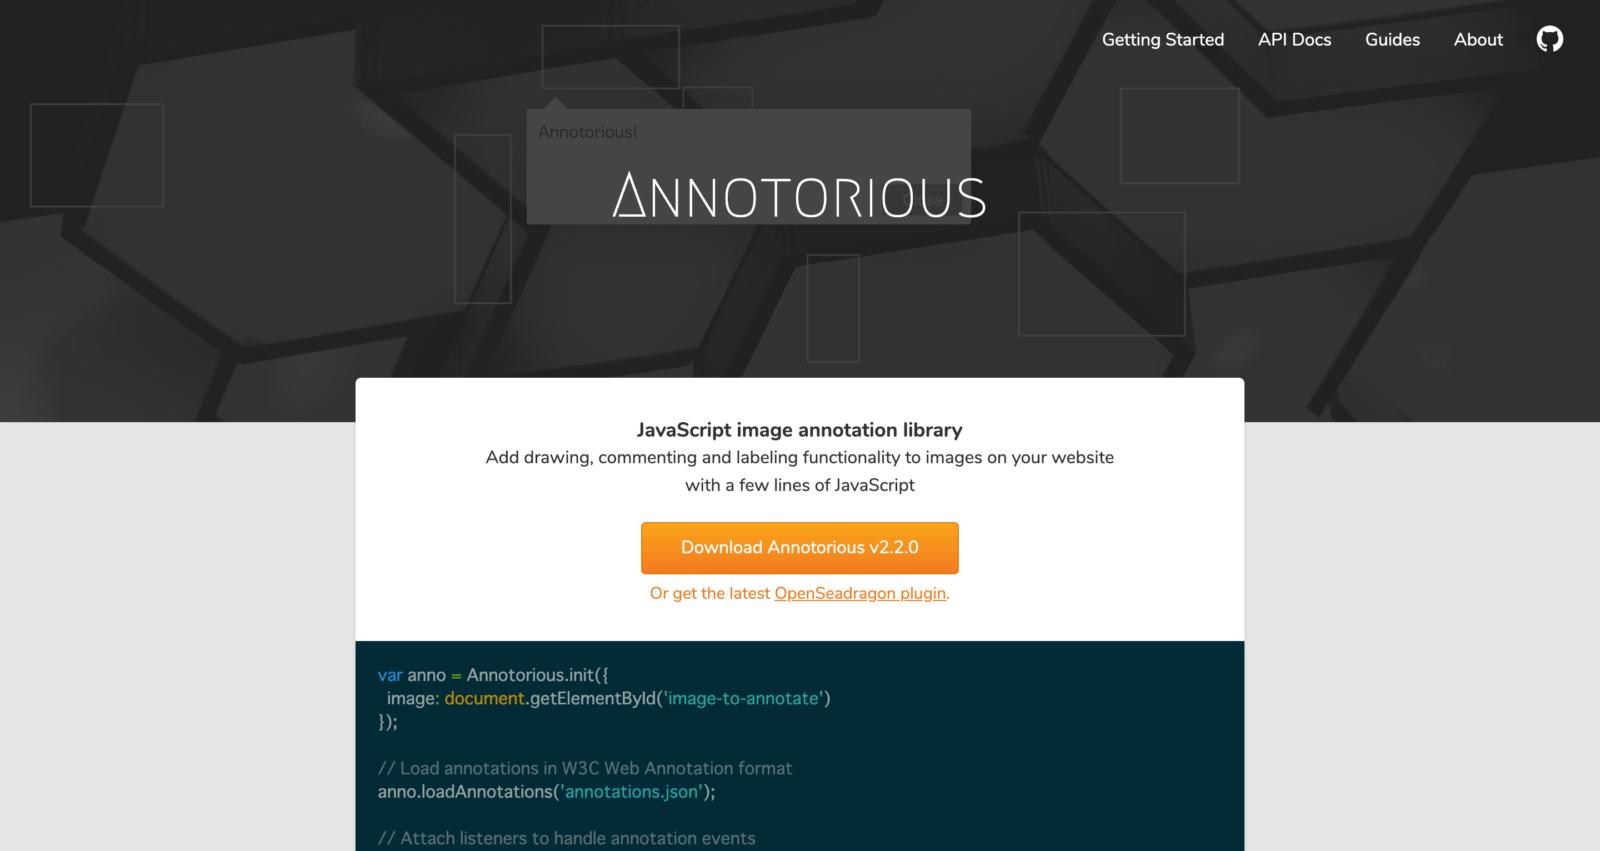 Annotorious